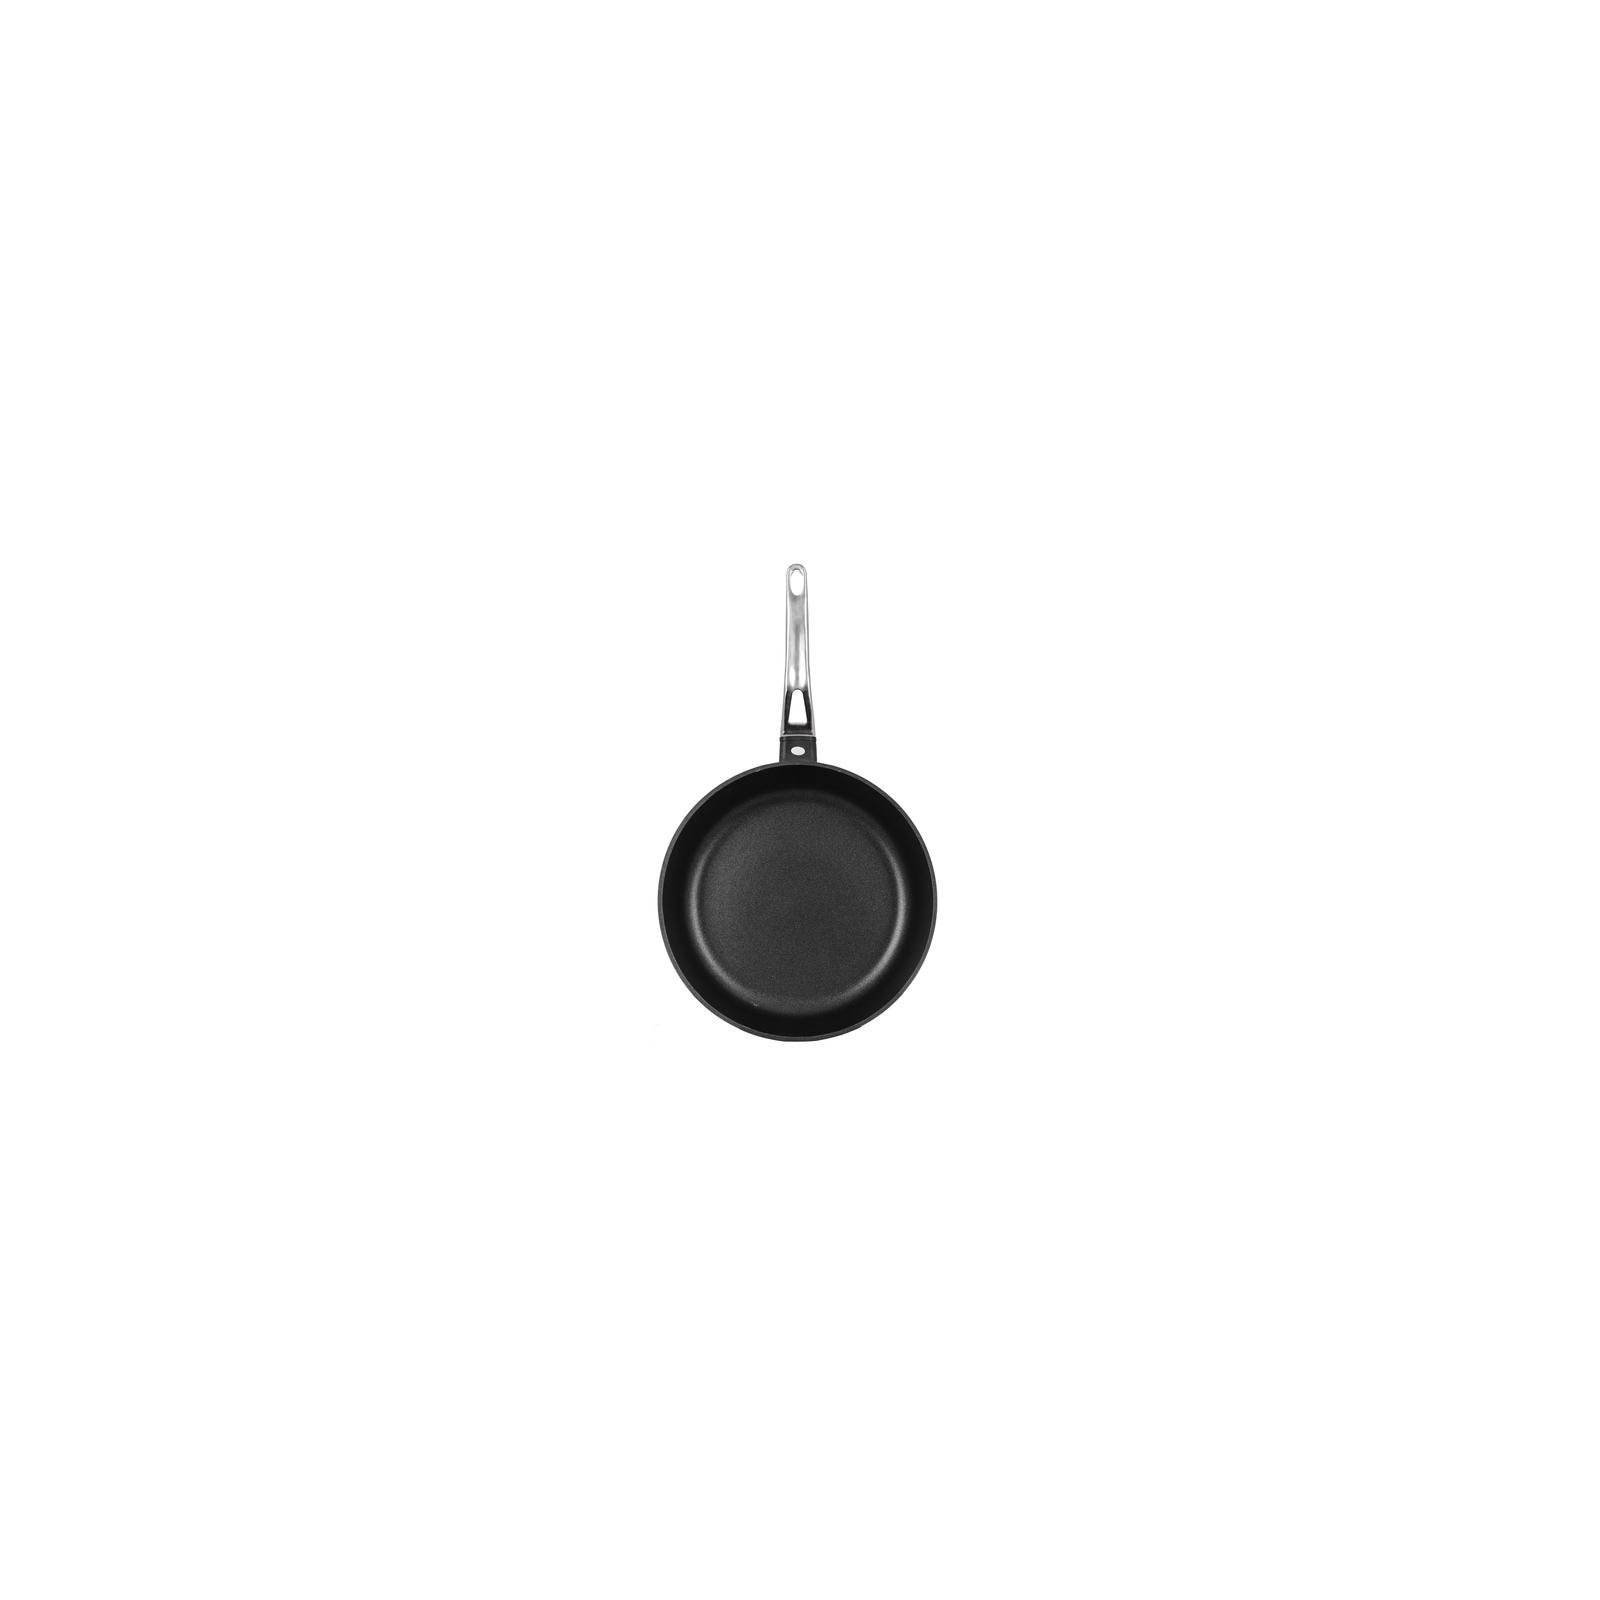 Сковорода Ringel IQ Be Chef 28 см (RG-1126-28) изображение 3